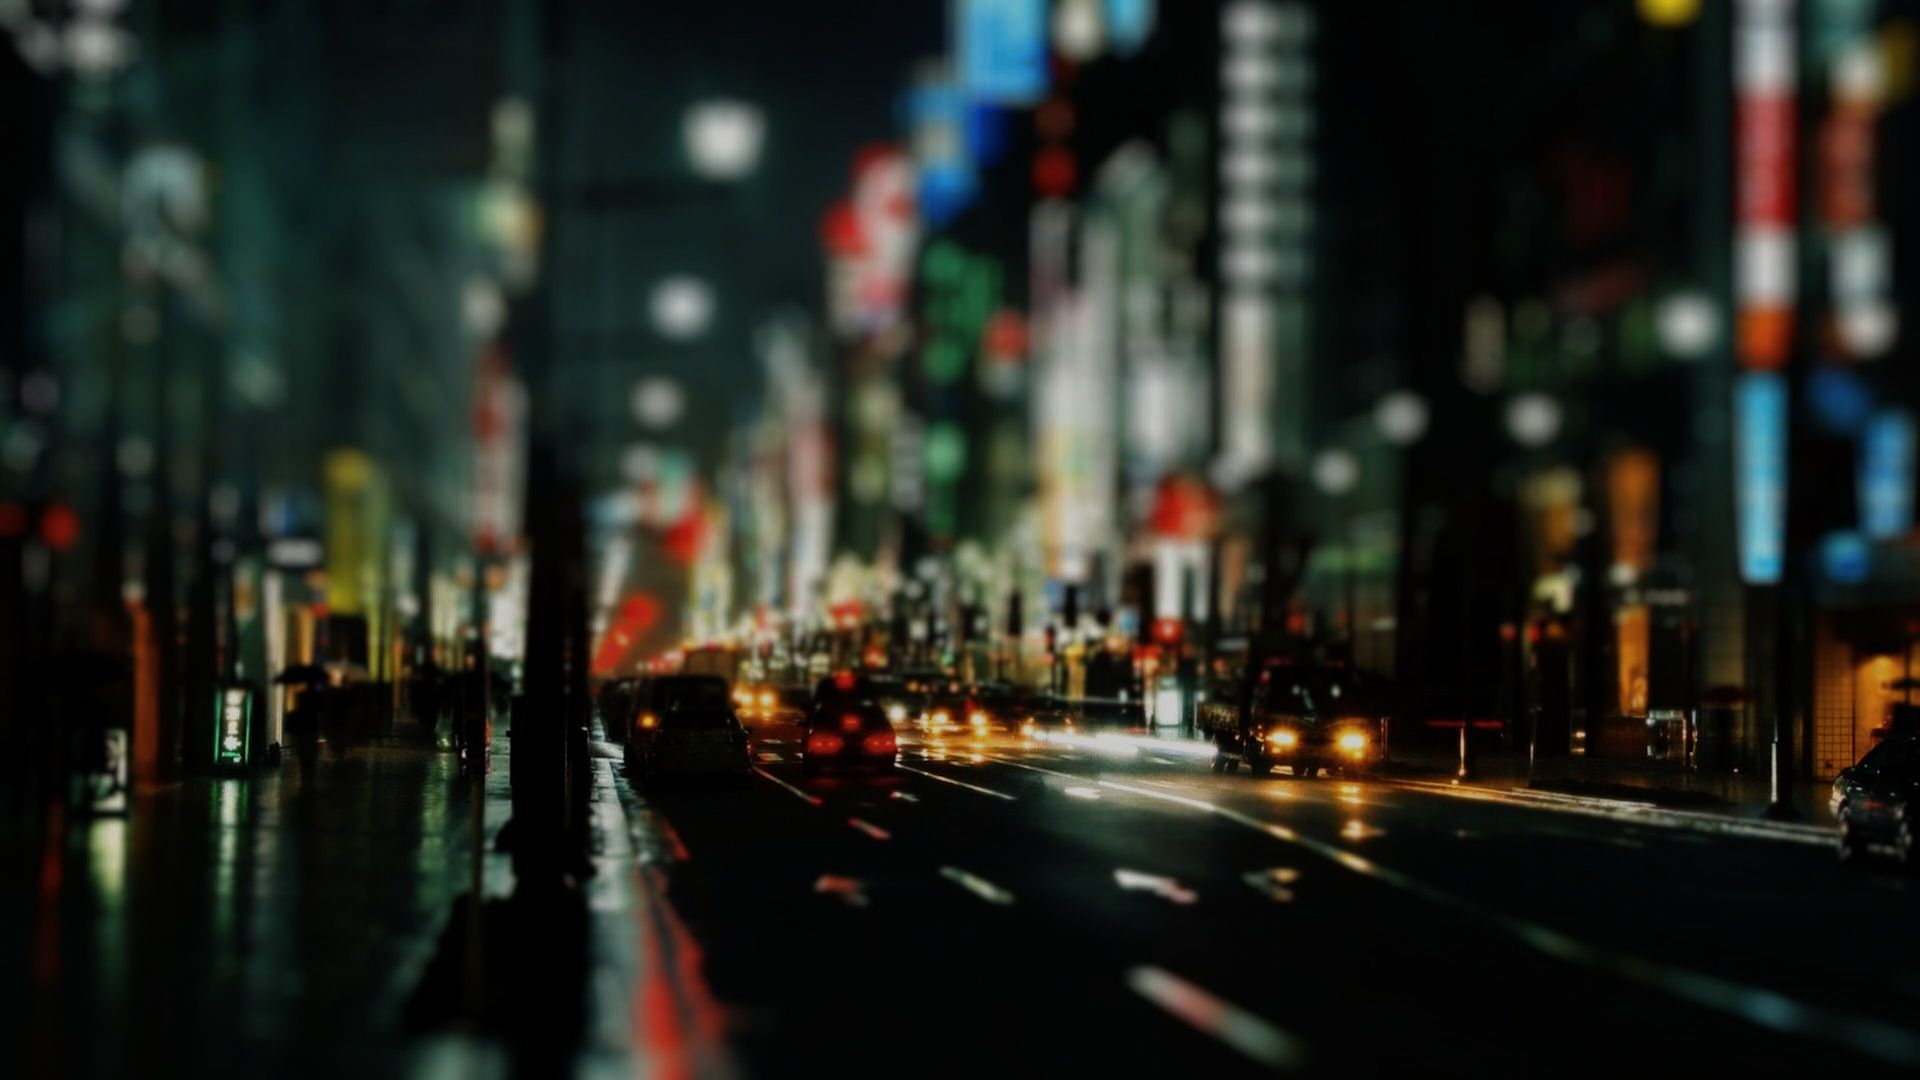 Wallpapers City Night Hd At Street Lights